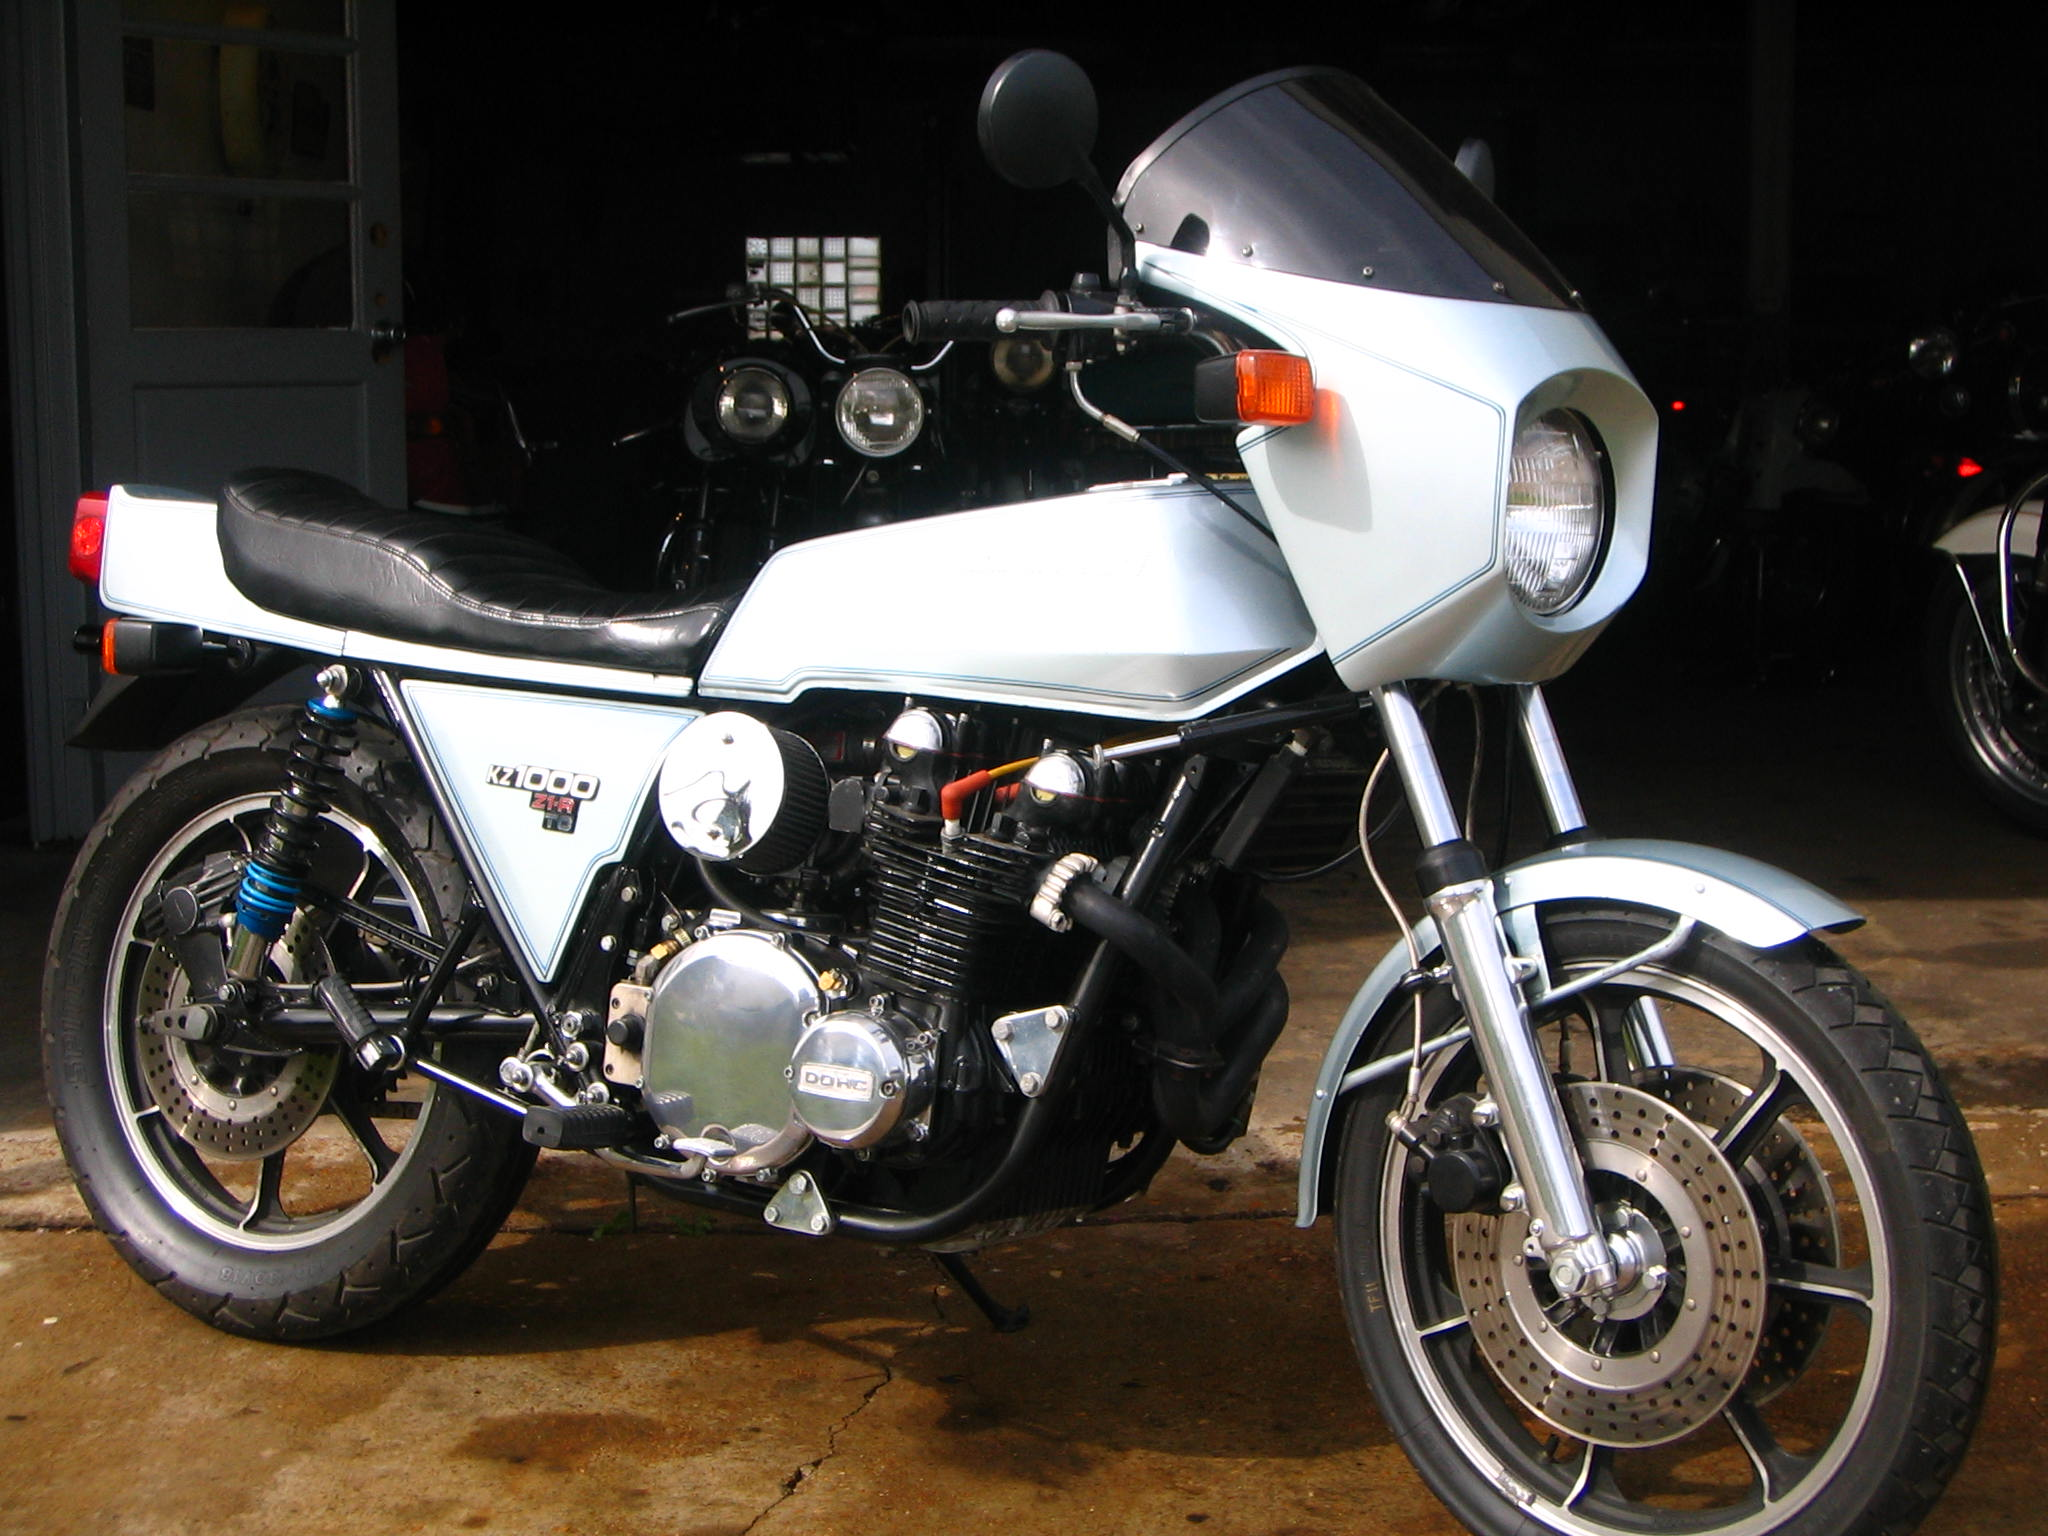 1978 Kawasaki Z1r Turbo